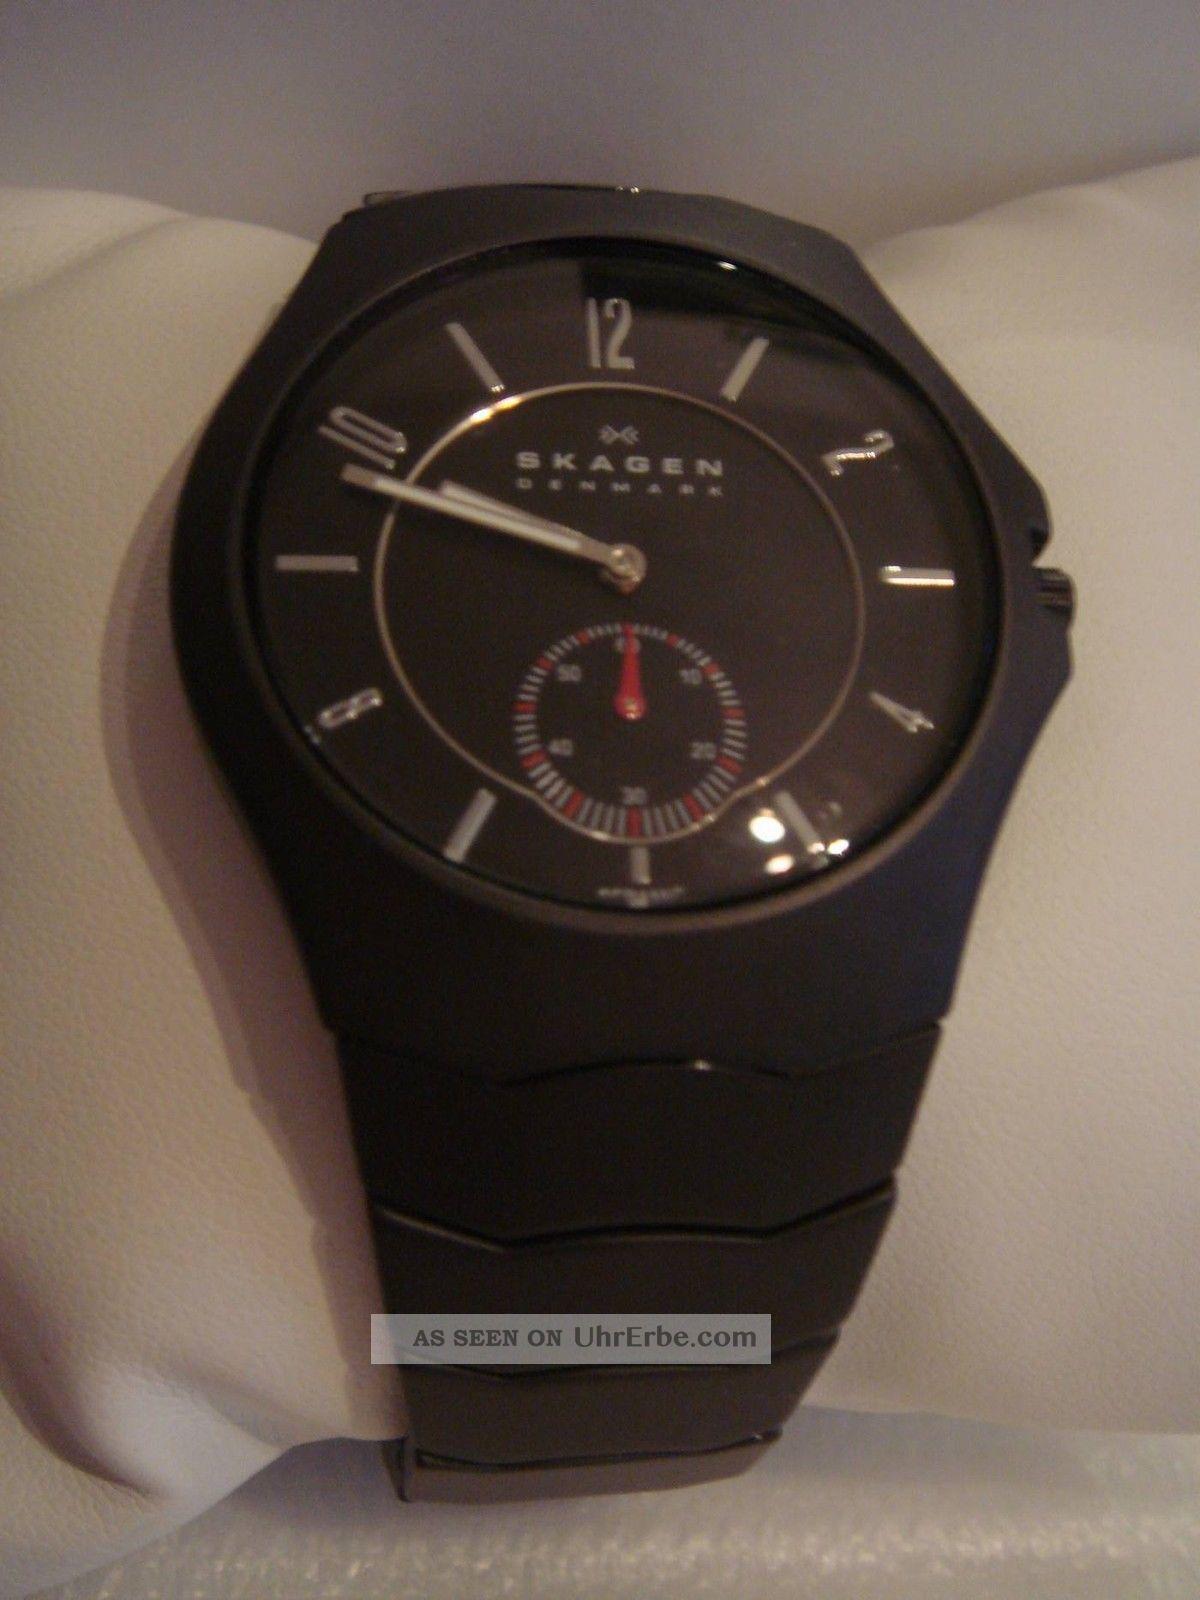 Skagen Slimline Ceramic 815 Lbxc Armbanduhren Bild